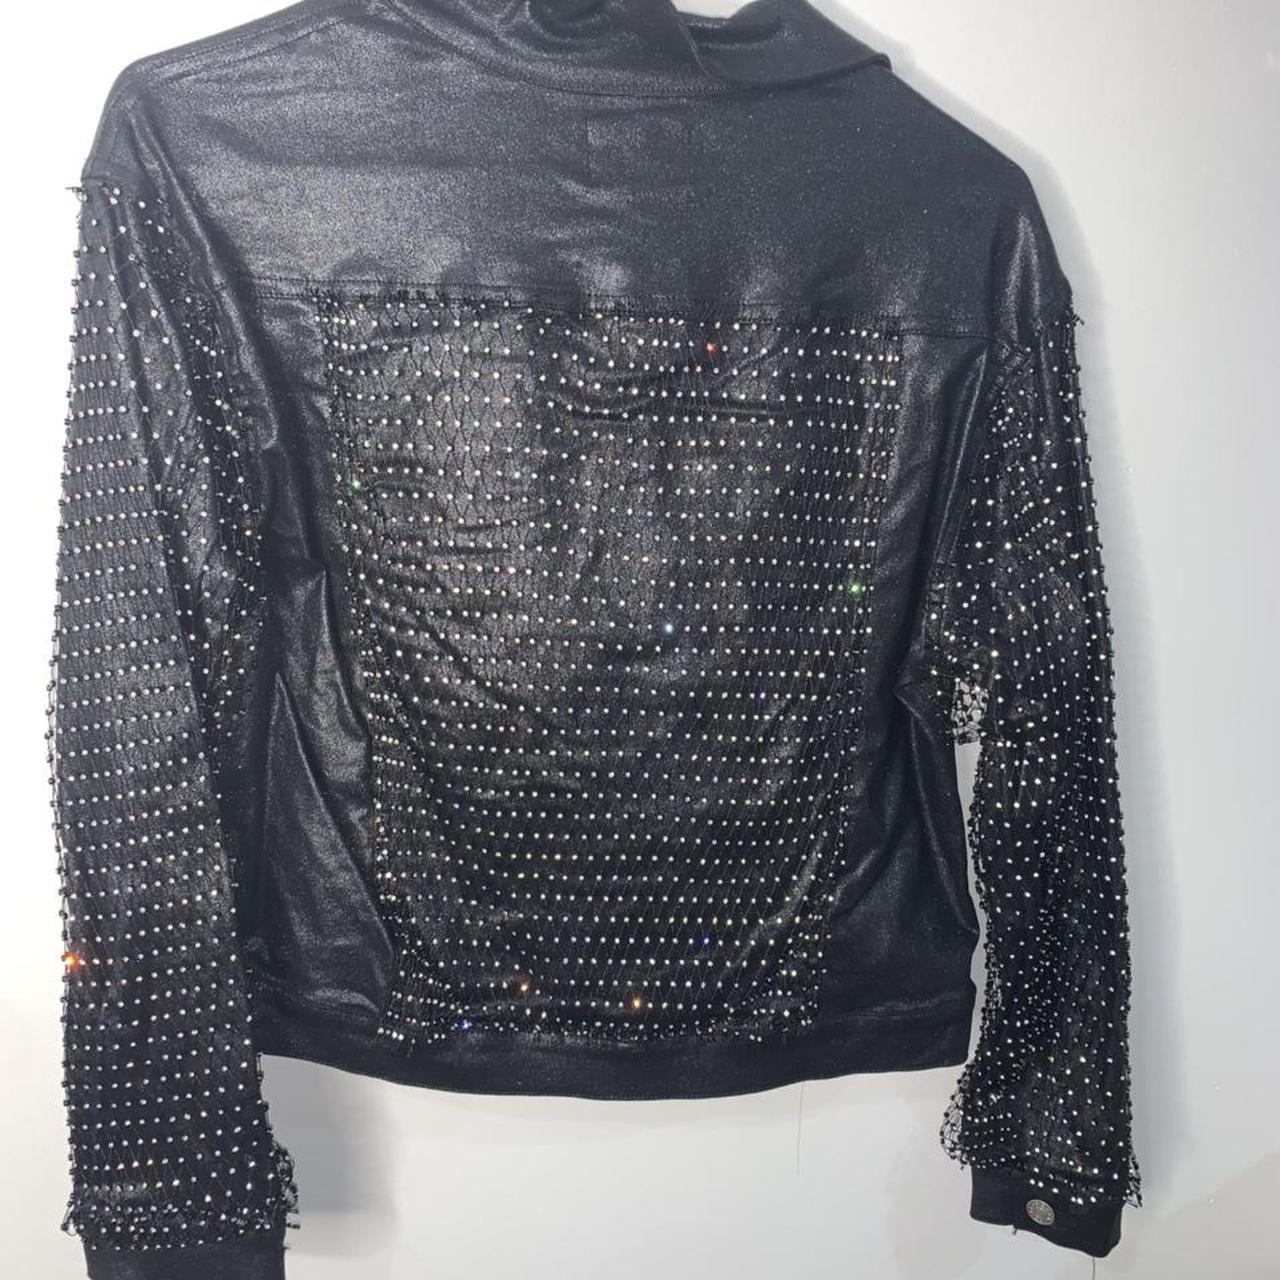 Product Image 1 - Brand New Metallic Rhinestone Jacket,